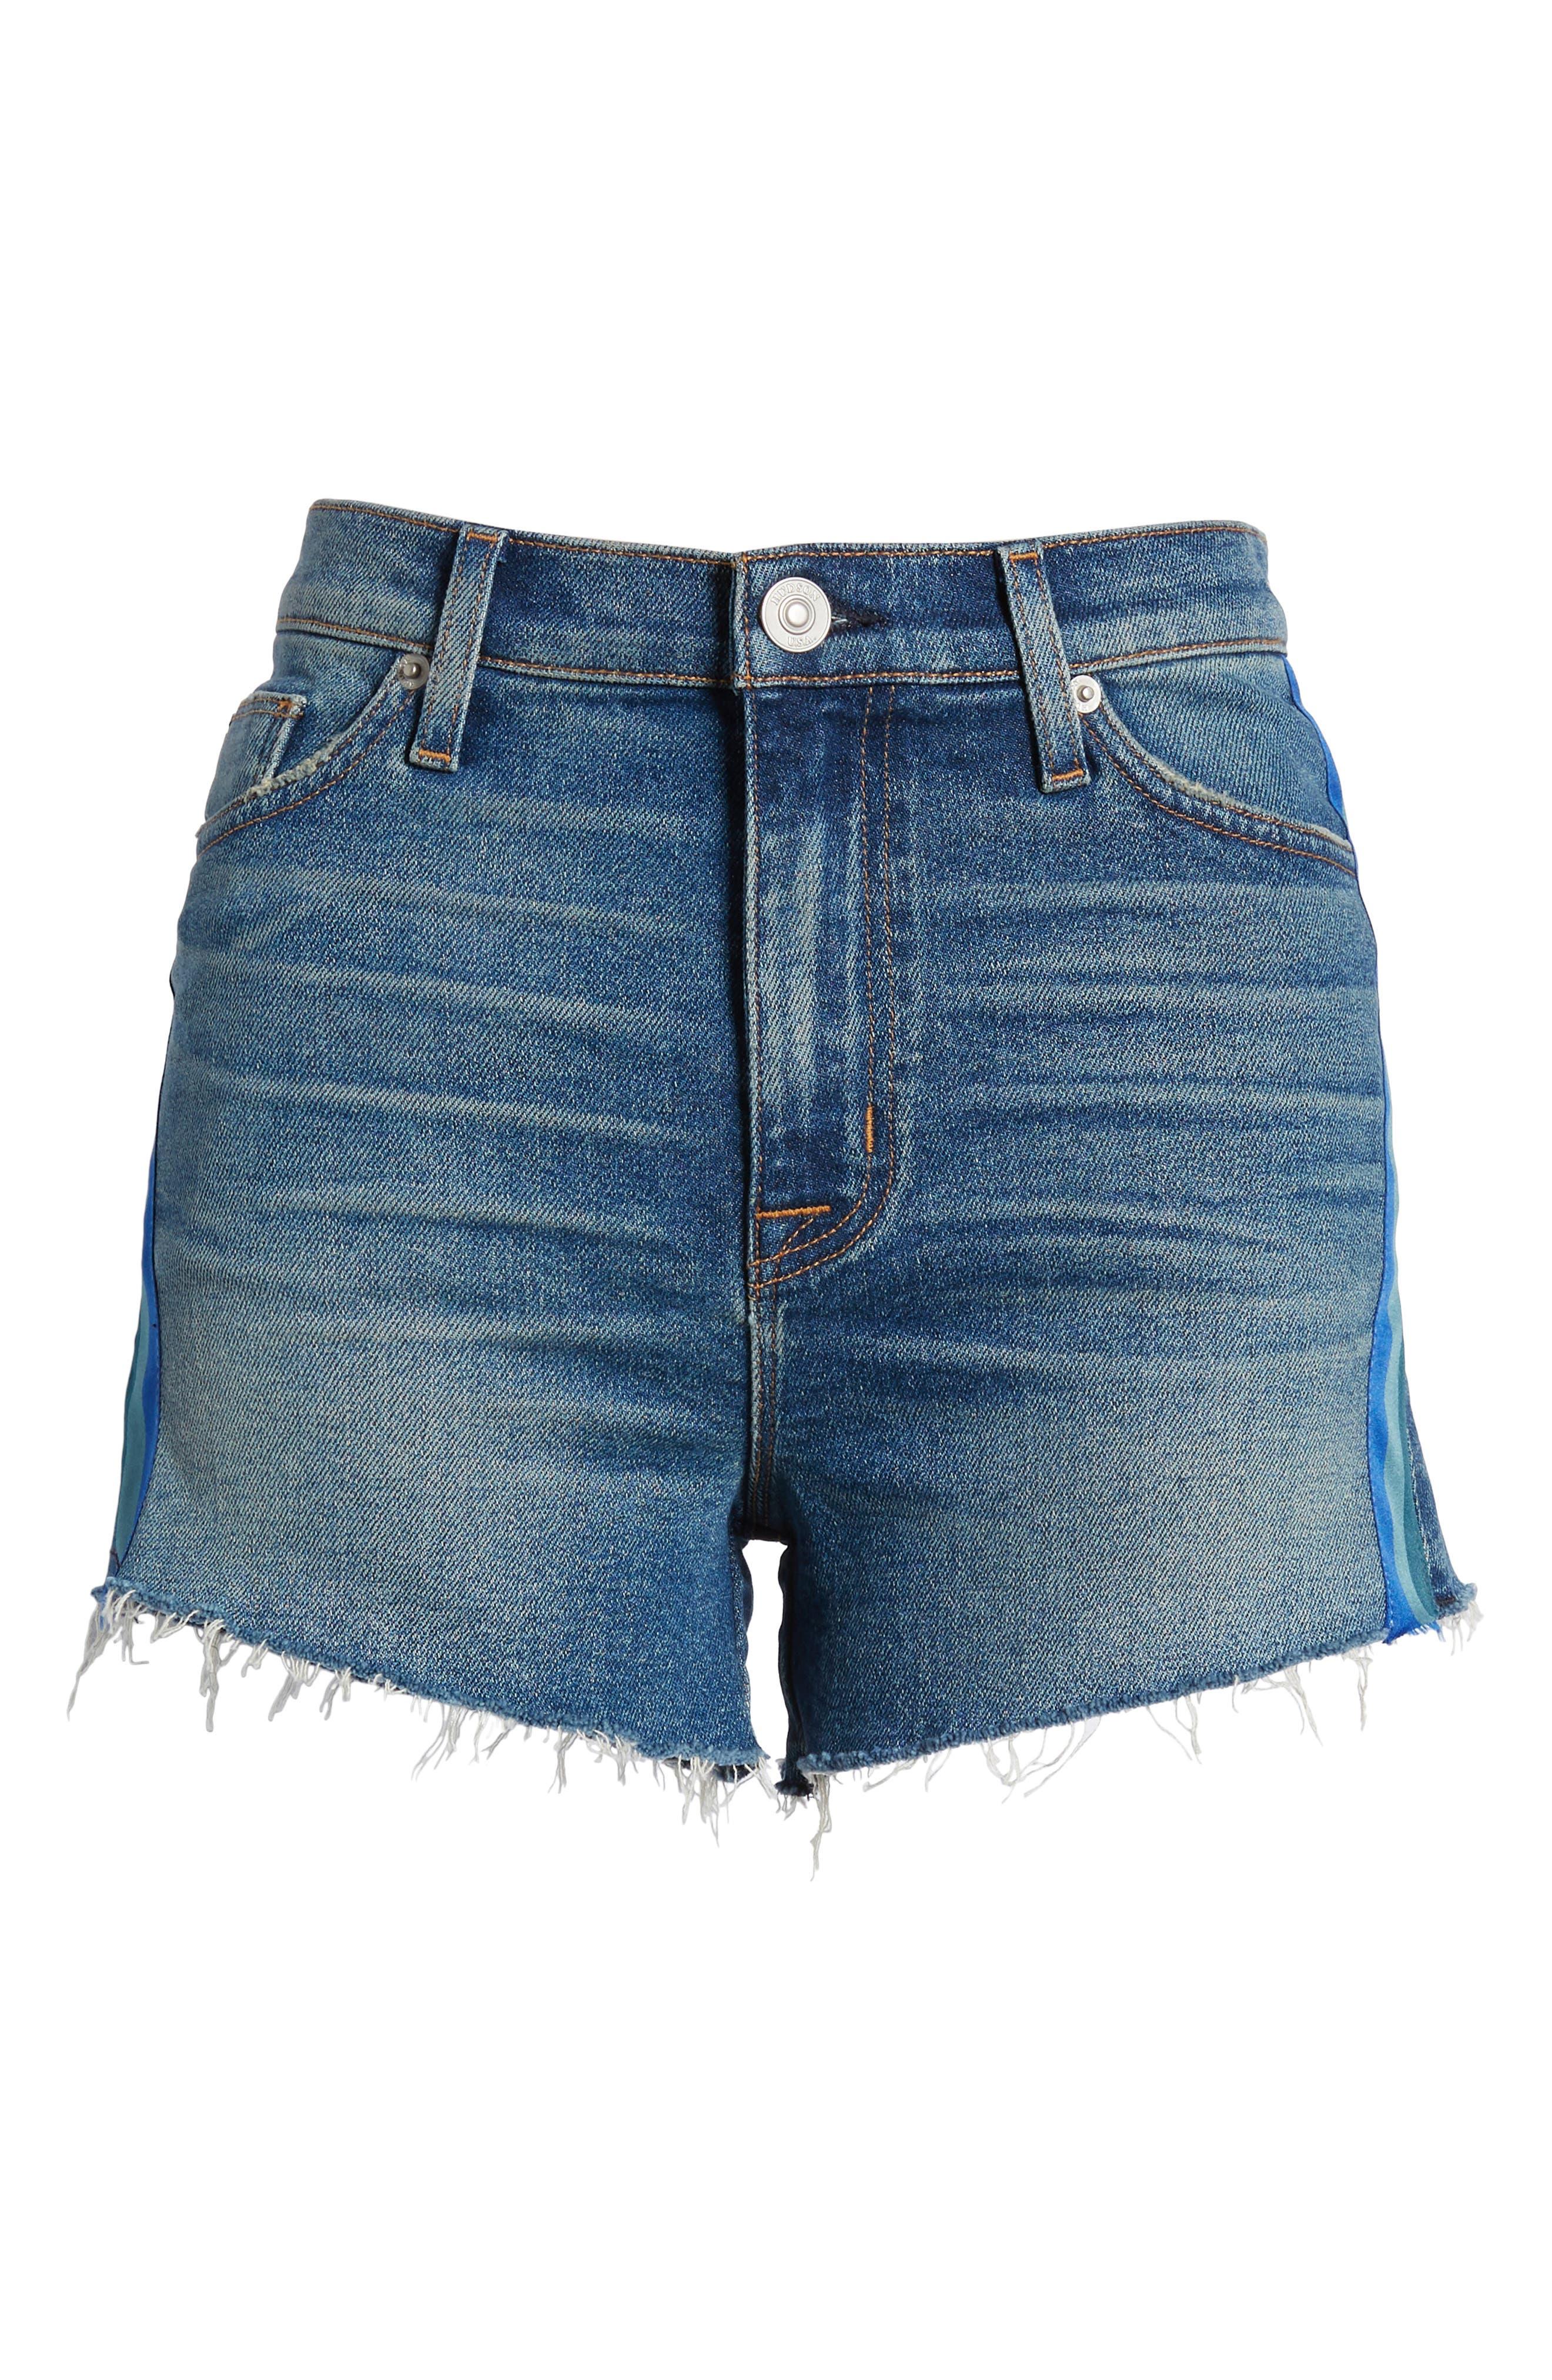 Sade Cutoff Denim Shorts,                             Alternate thumbnail 7, color,                             421